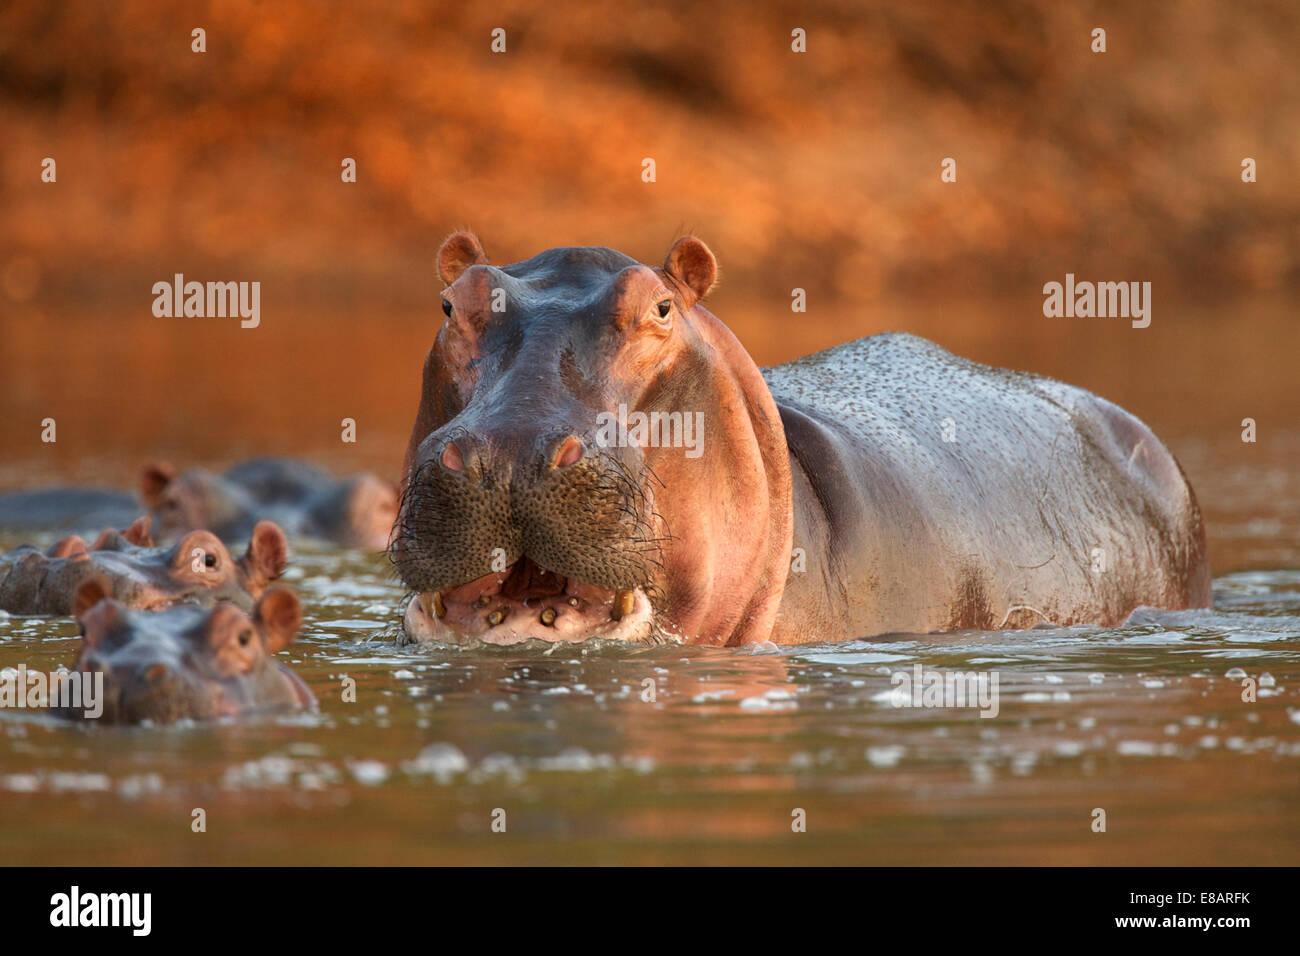 Alert hippopotamus (hippopotamus amphibius), Mana Pools National Park, Zimbabwe - Stock Image